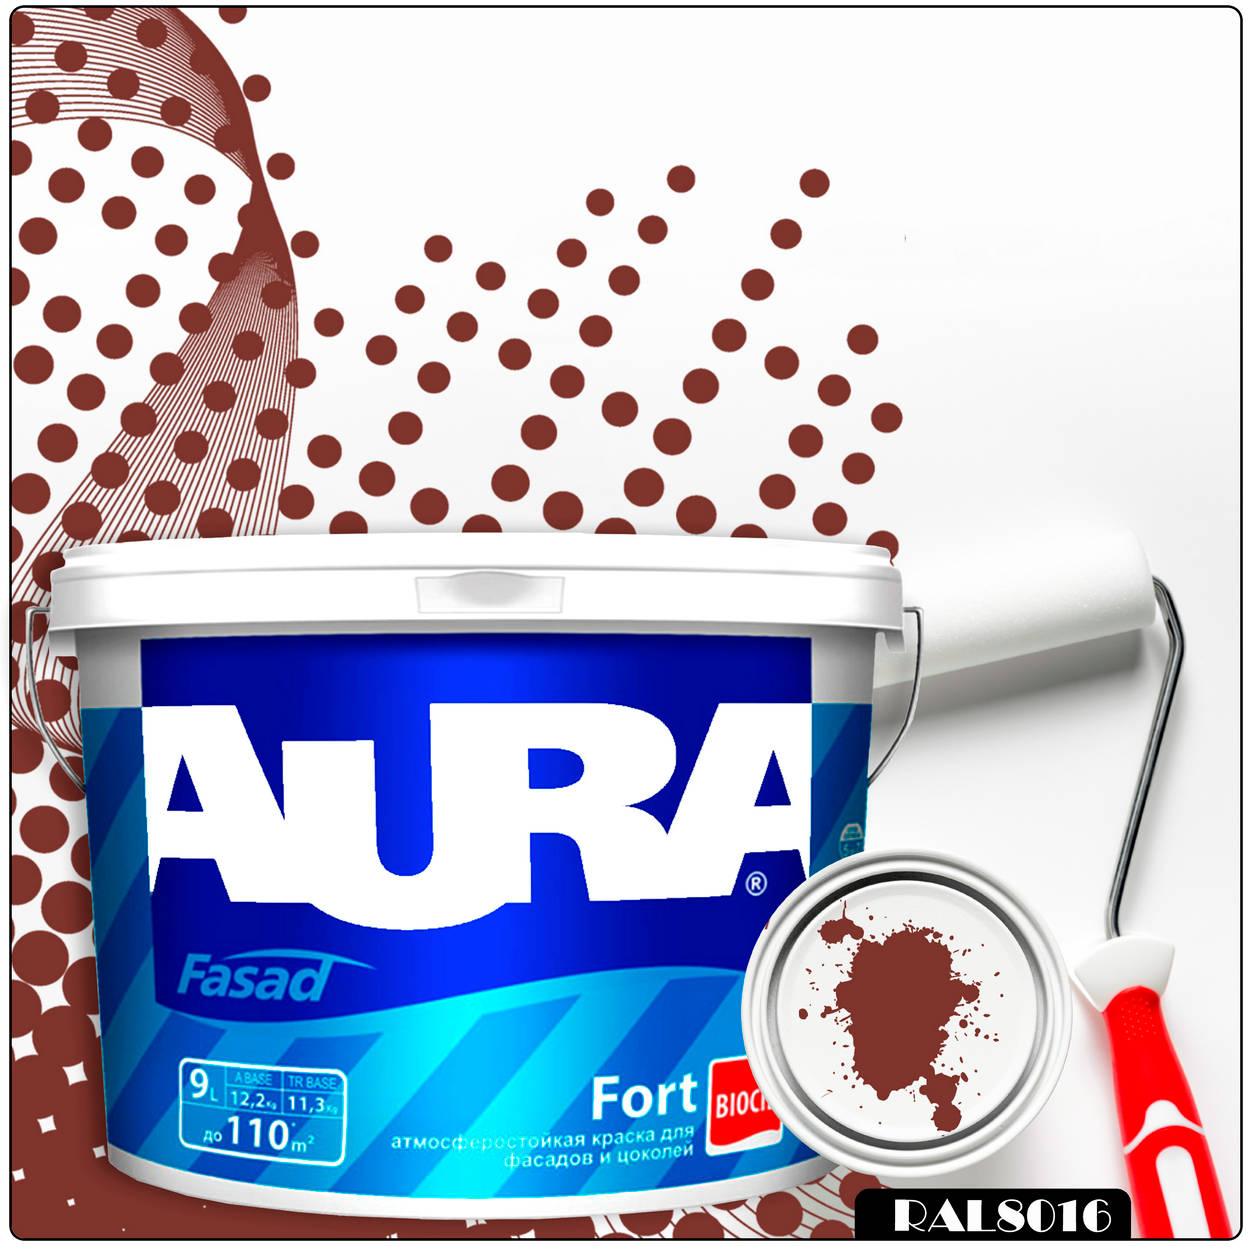 Фото 11 - Краска Aura Fasad Fort, RAL 8016 Коричневый махагон, латексная, матовая, для фасада и цоколей, 9л, Аура.